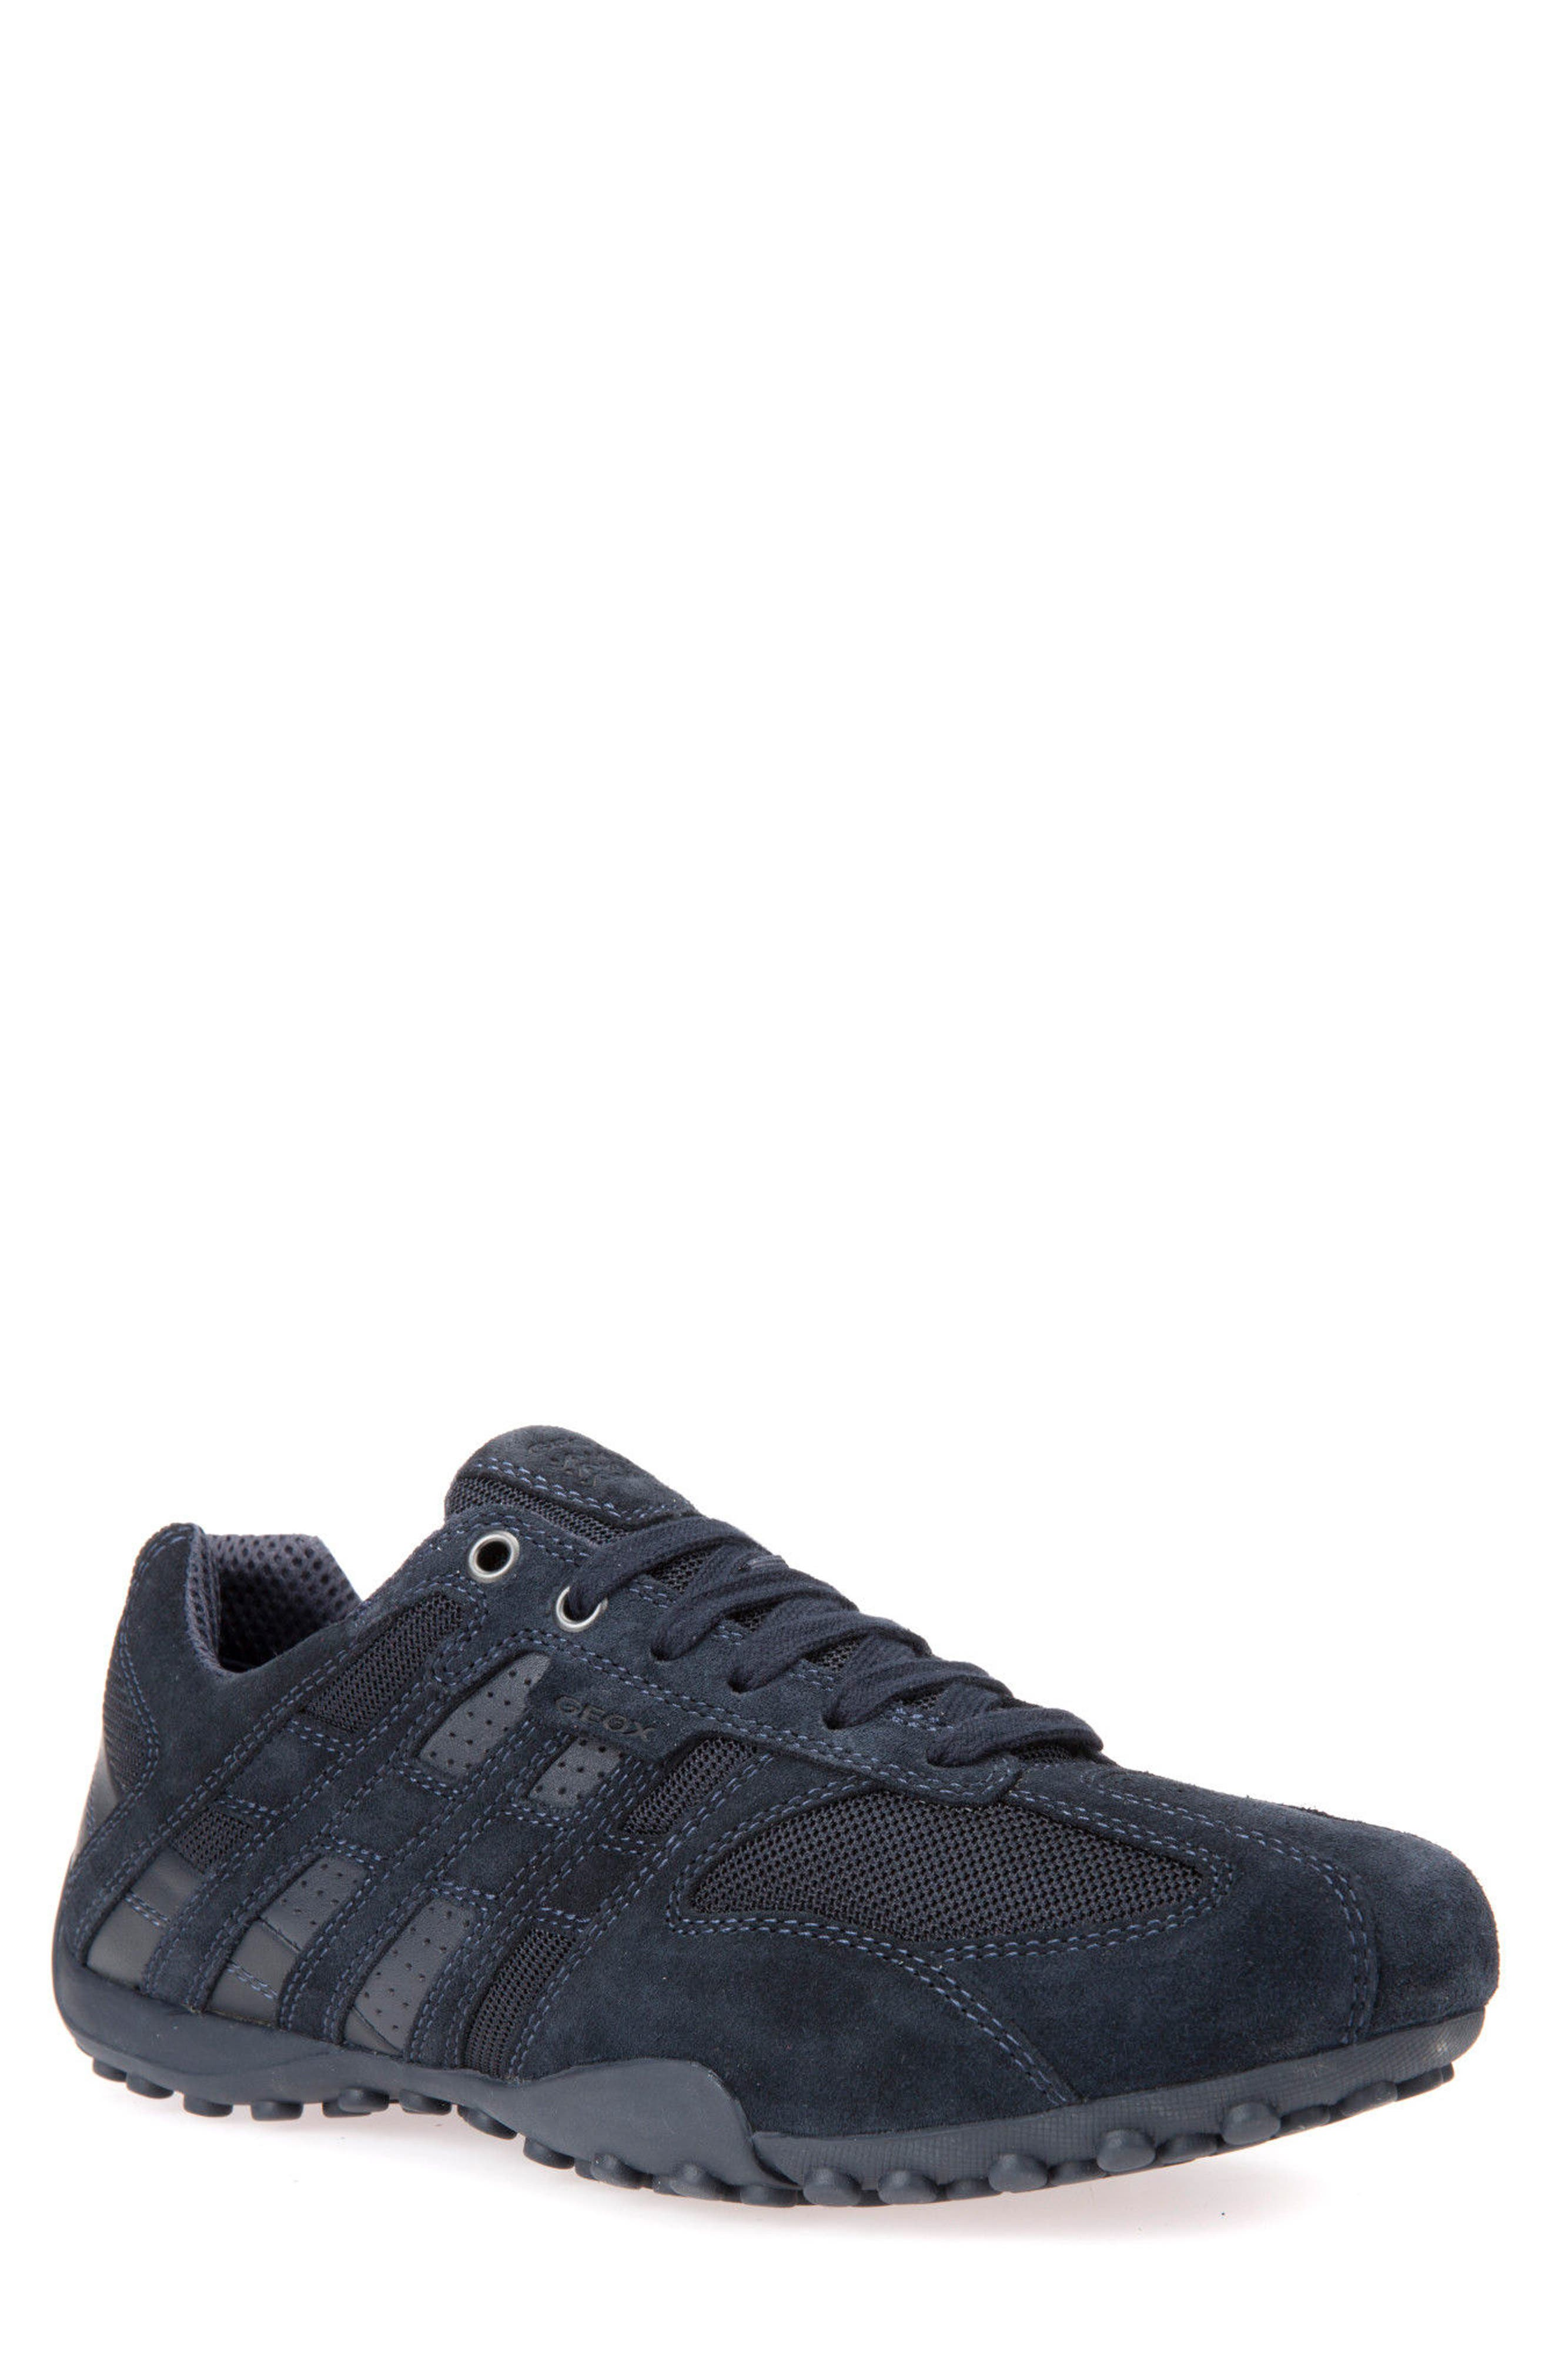 Geox Snake 125 Low Top Sneaker (Men)